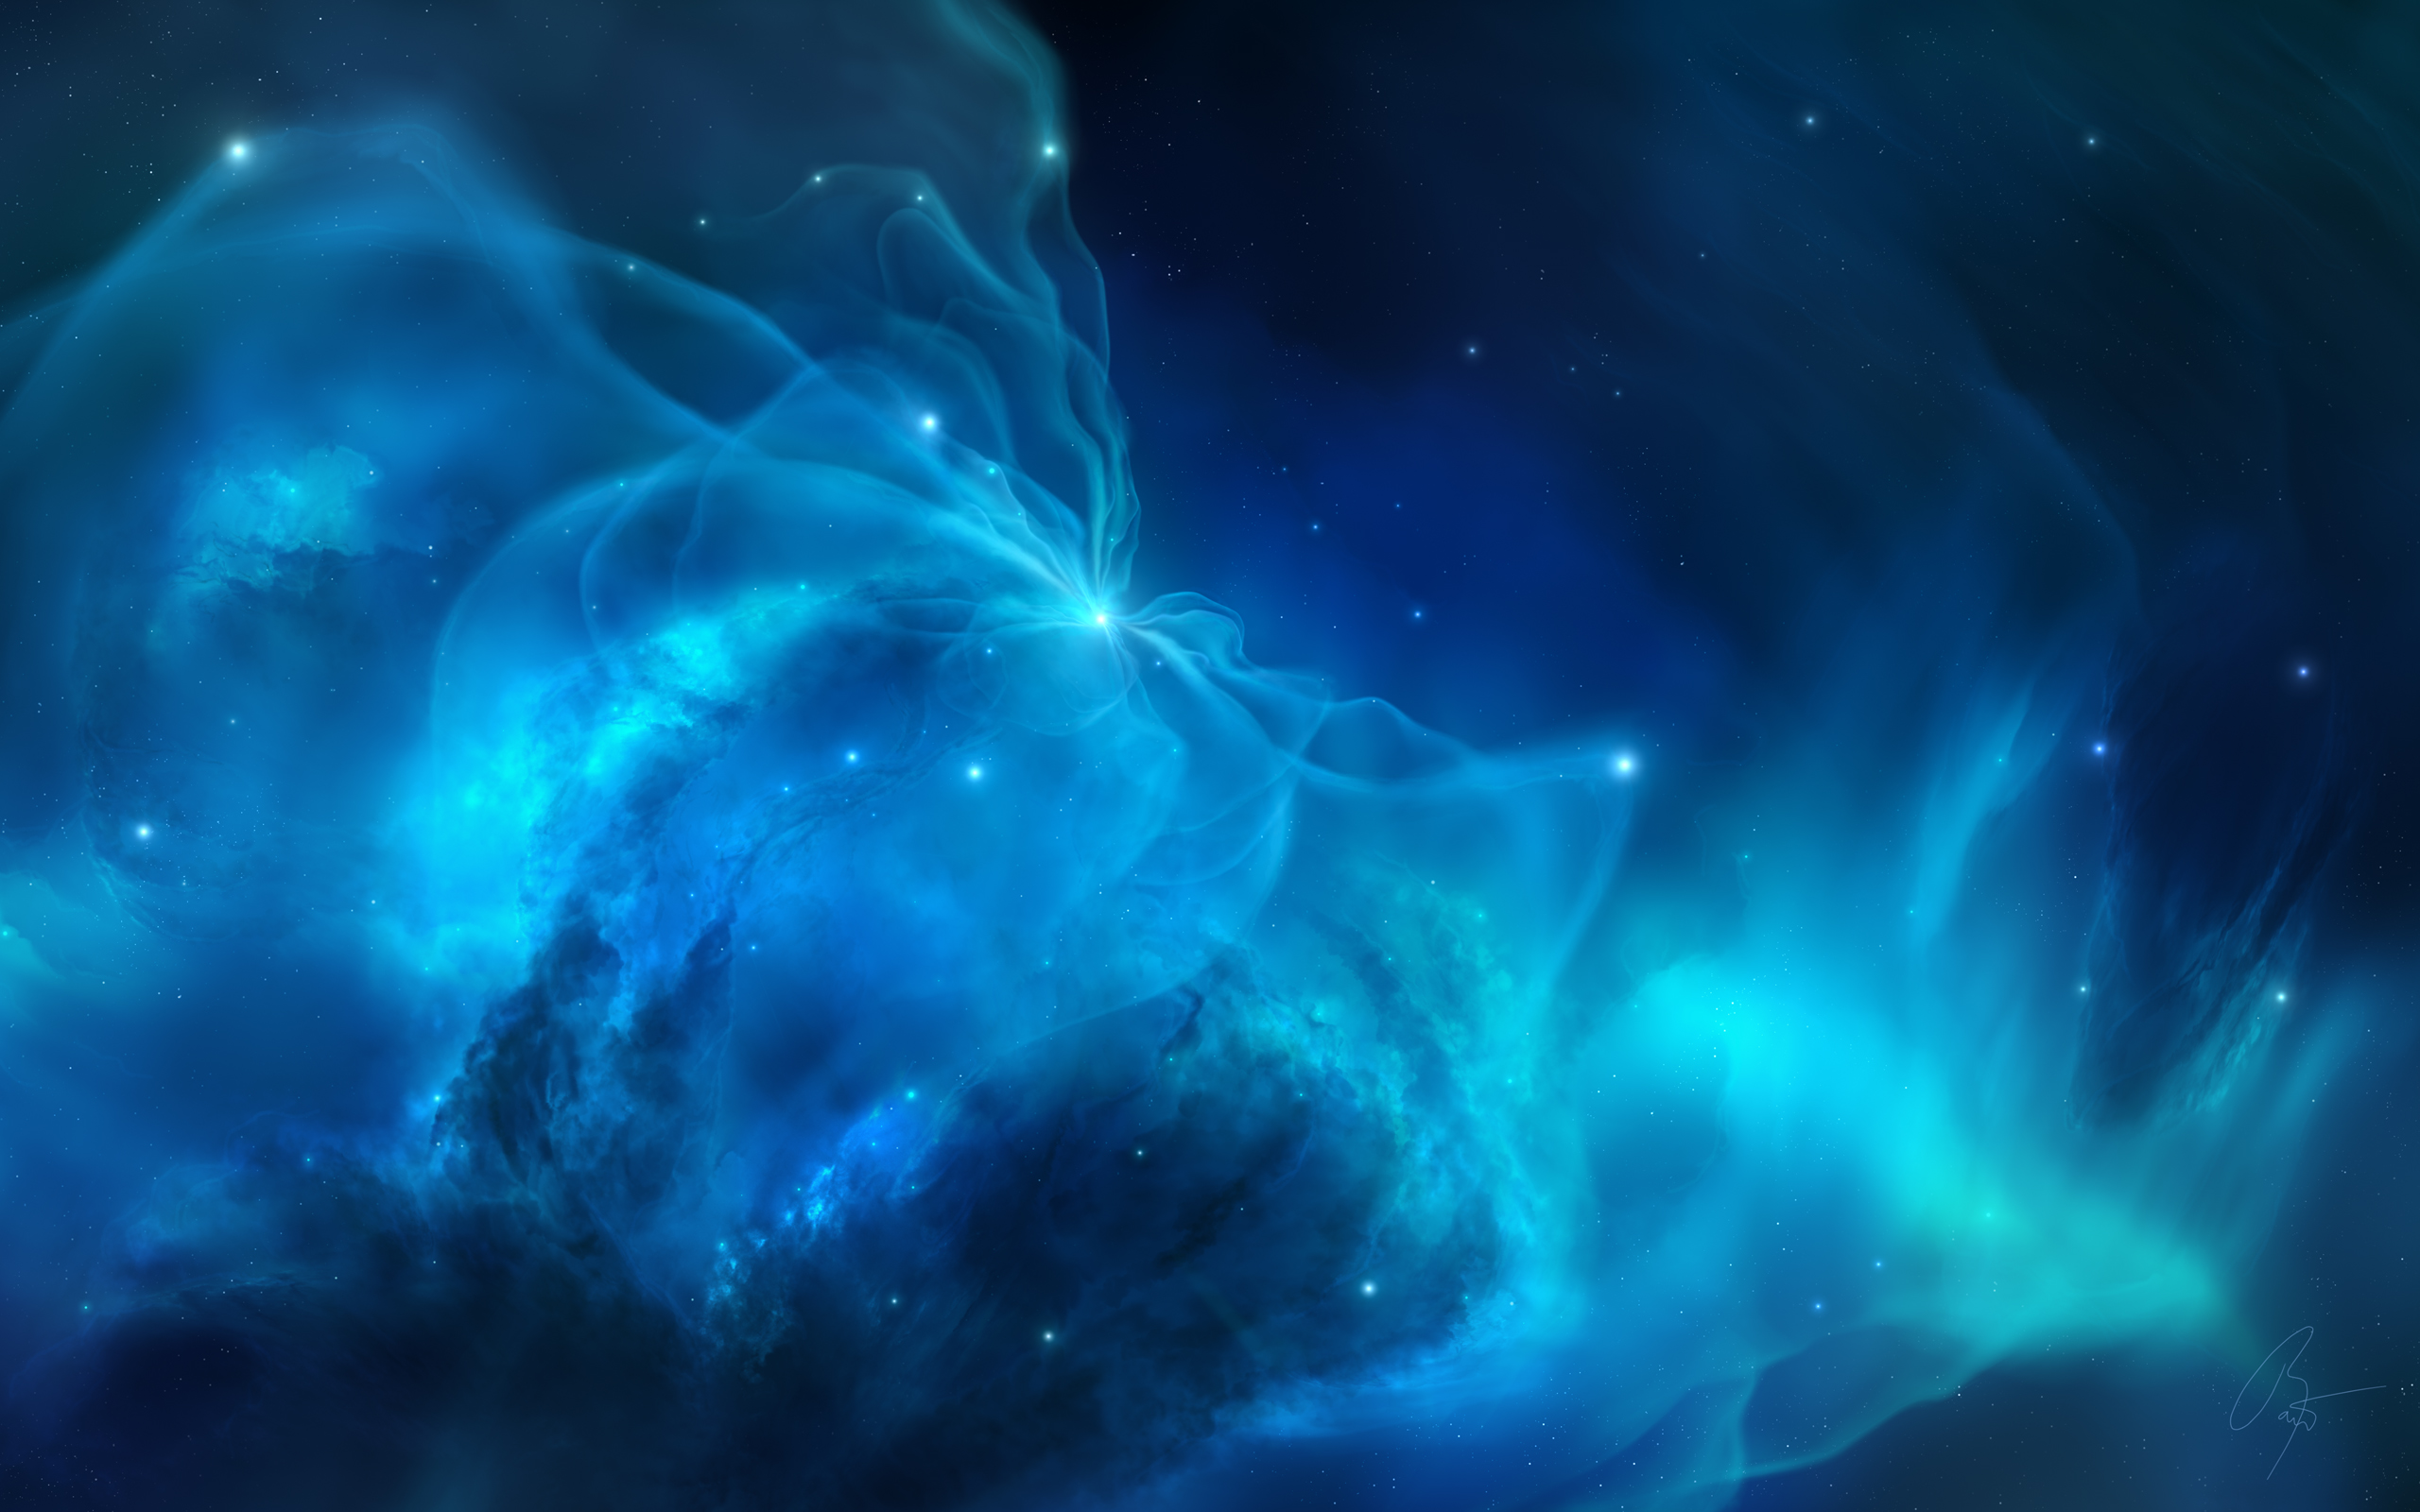 Blue Nebula Wallpaper - WallpaperSafari Blue Nebula Wallpaper Widescreen